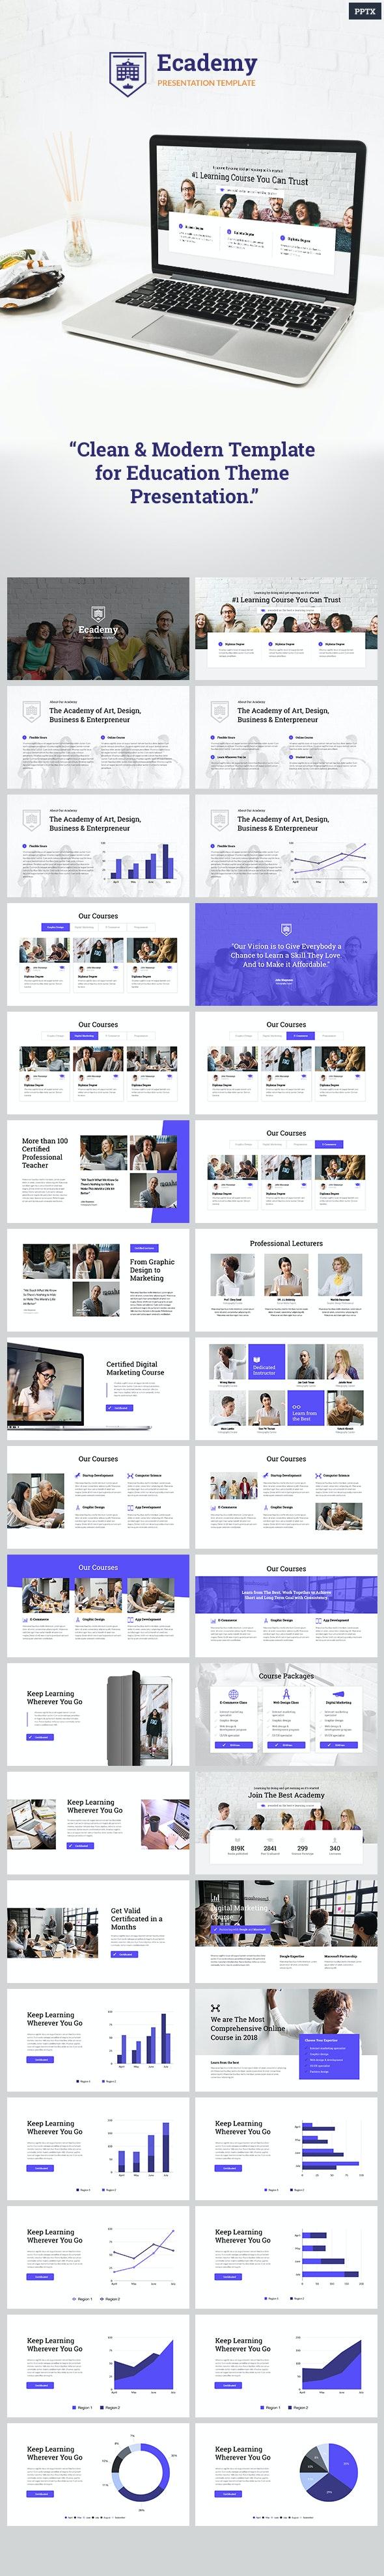 Ecademy - Powerpoint Template - PowerPoint Templates Presentation Templates